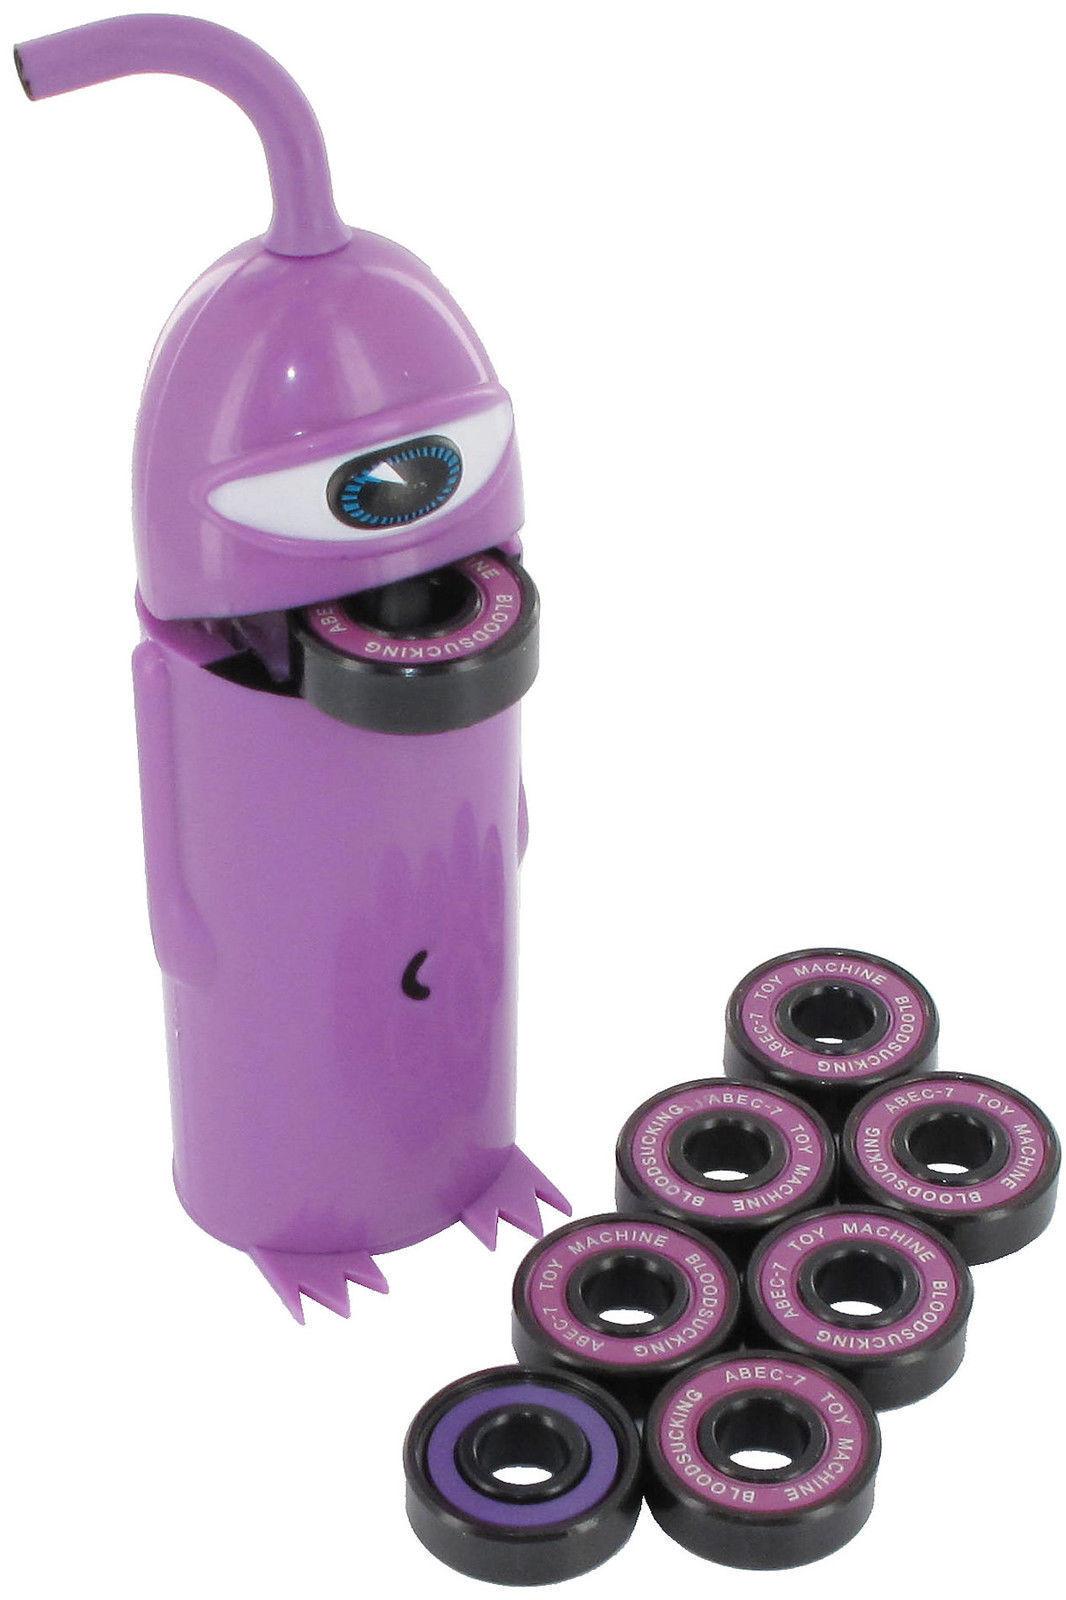 Toy Machine Abec Abec Machine 7 Skateboard Roulements b74003